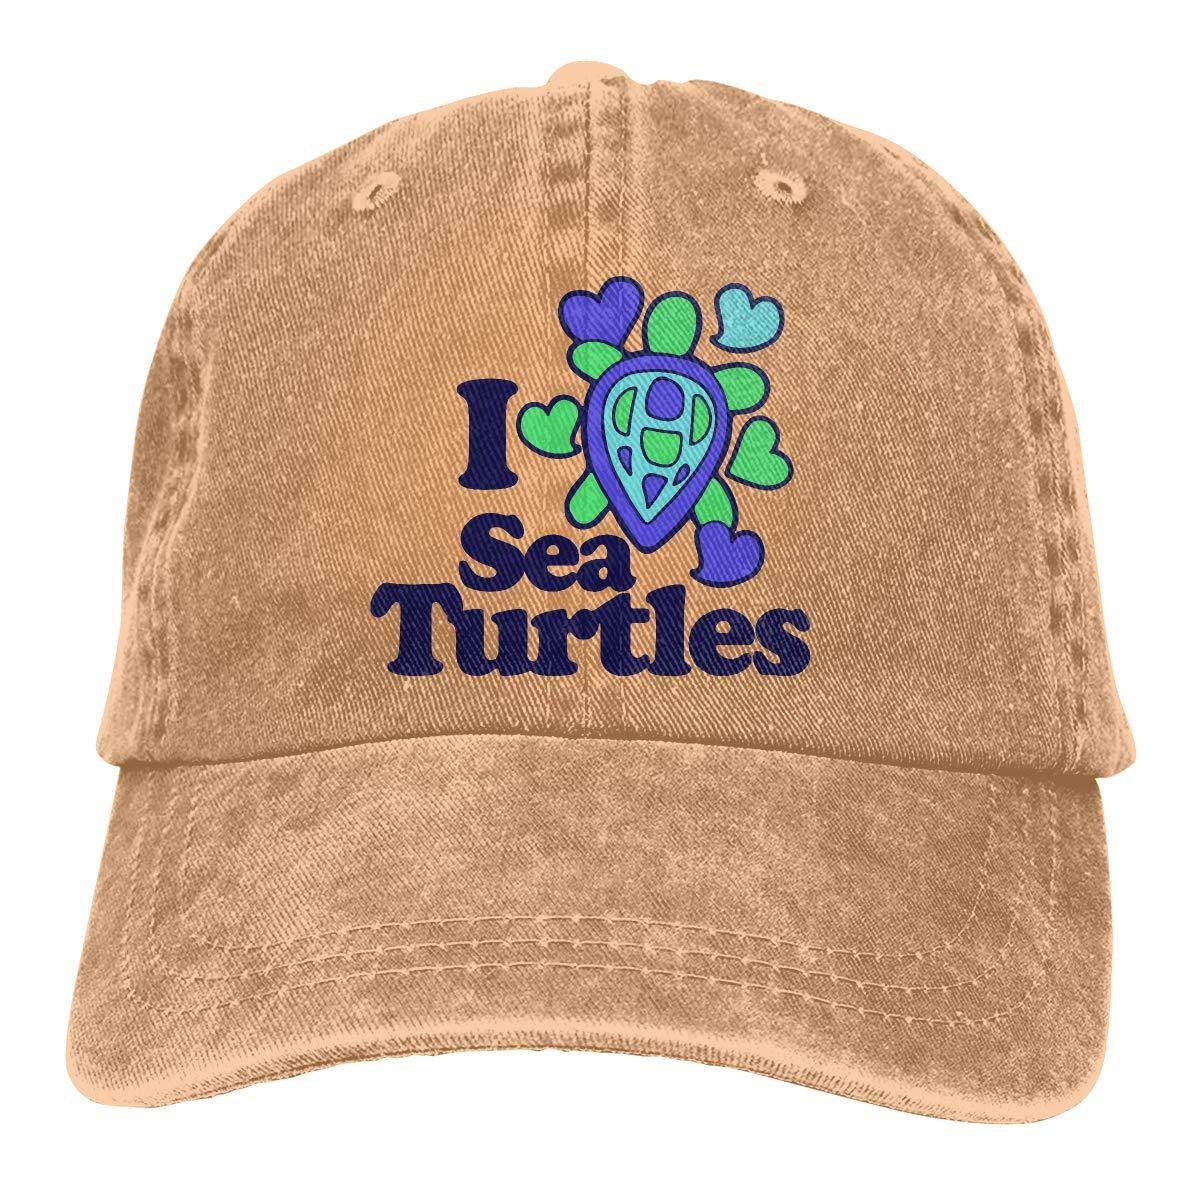 I Love Sea Turtles Unisex Custom Cowboy Casquette Adjustable Baseball Cap